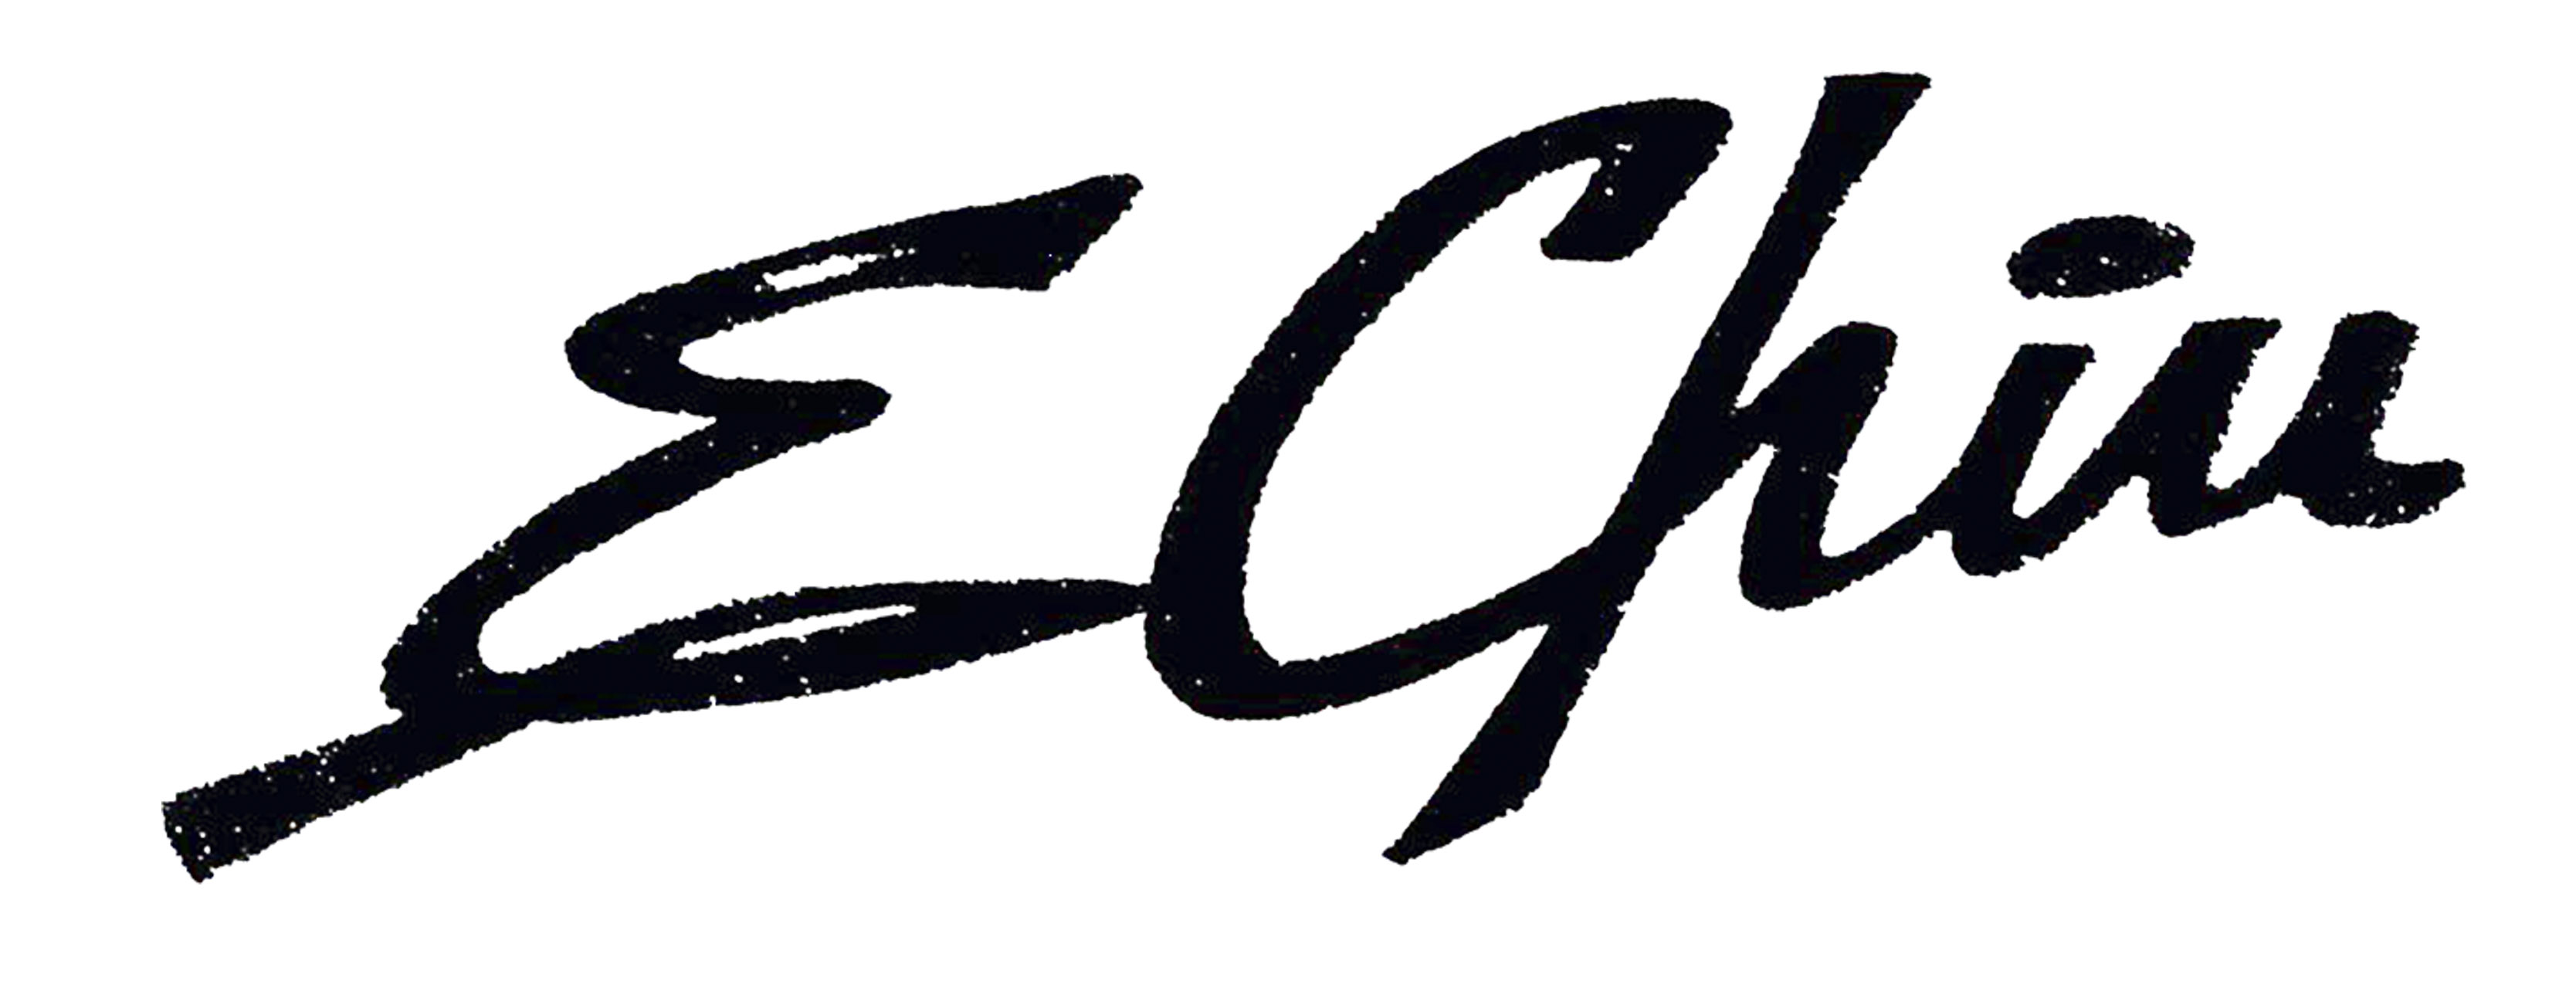 ENRIQUE CHIU's Signature